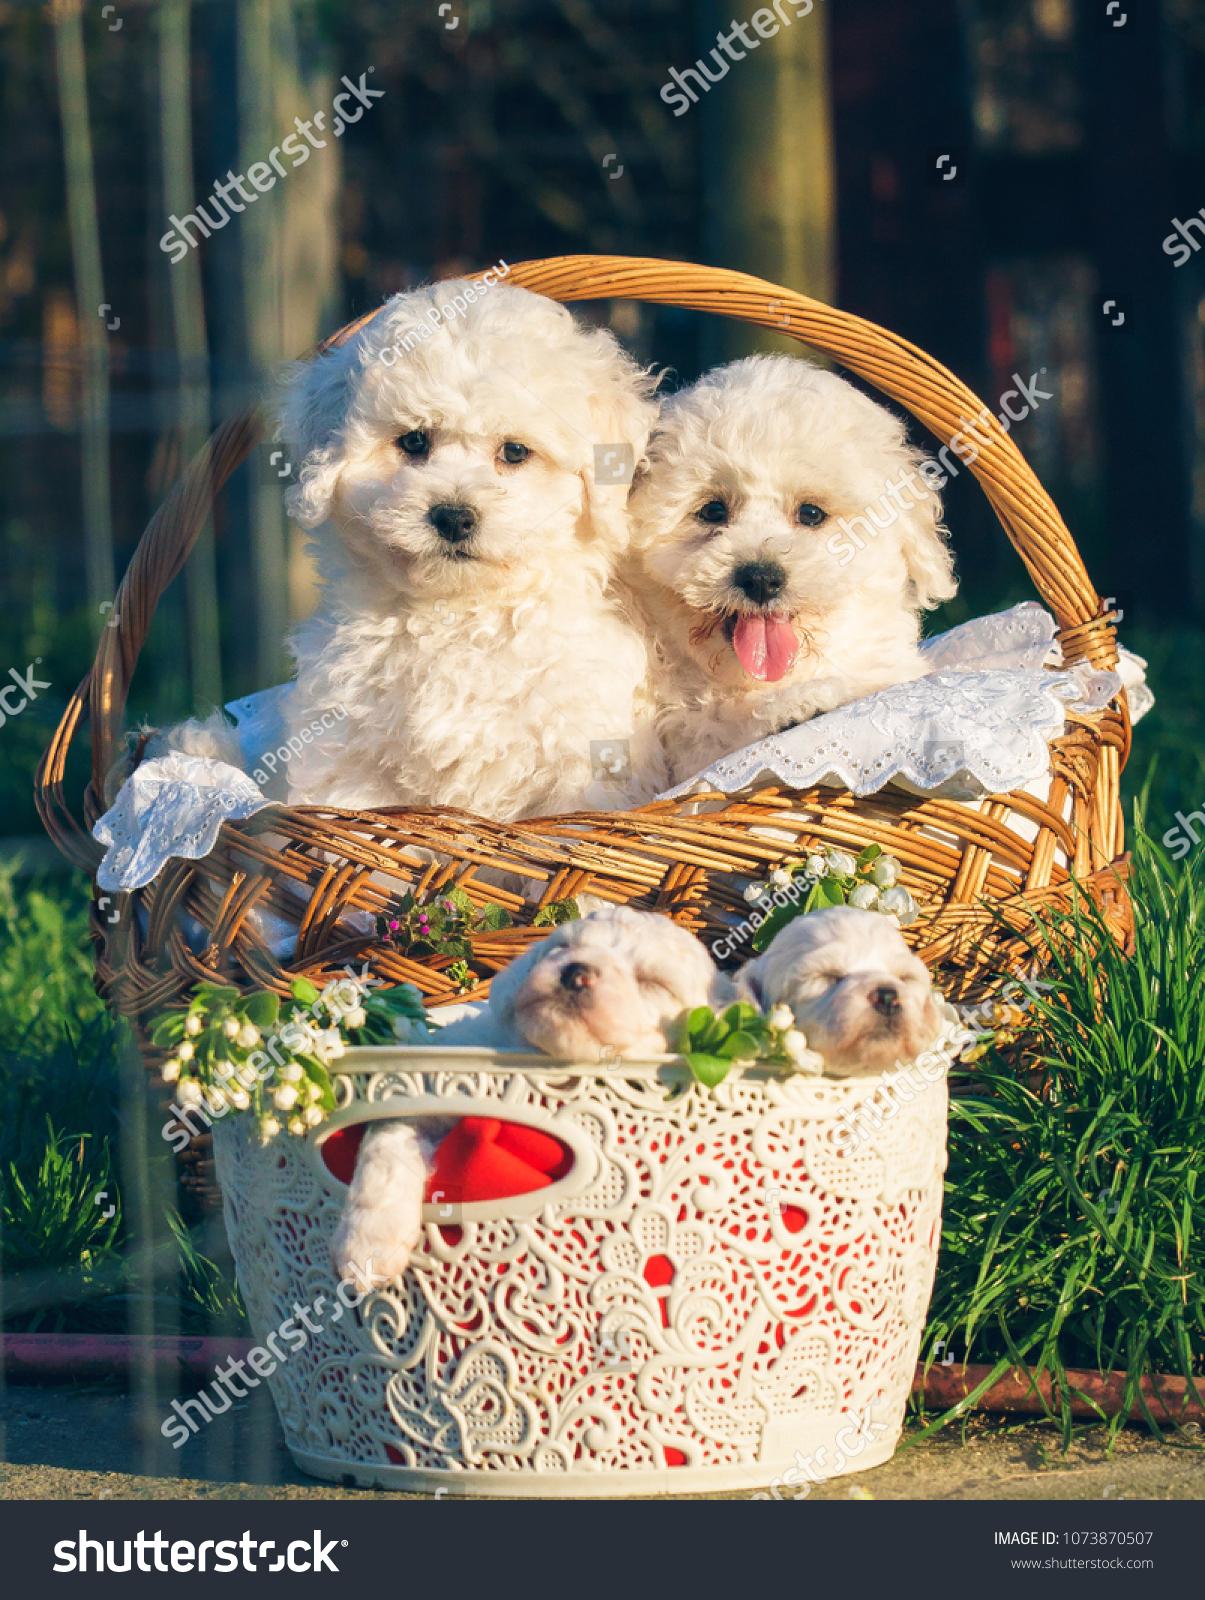 Cute Bichon Frise Puppies Babies Angels Stock Photo Edit Now 1073870507